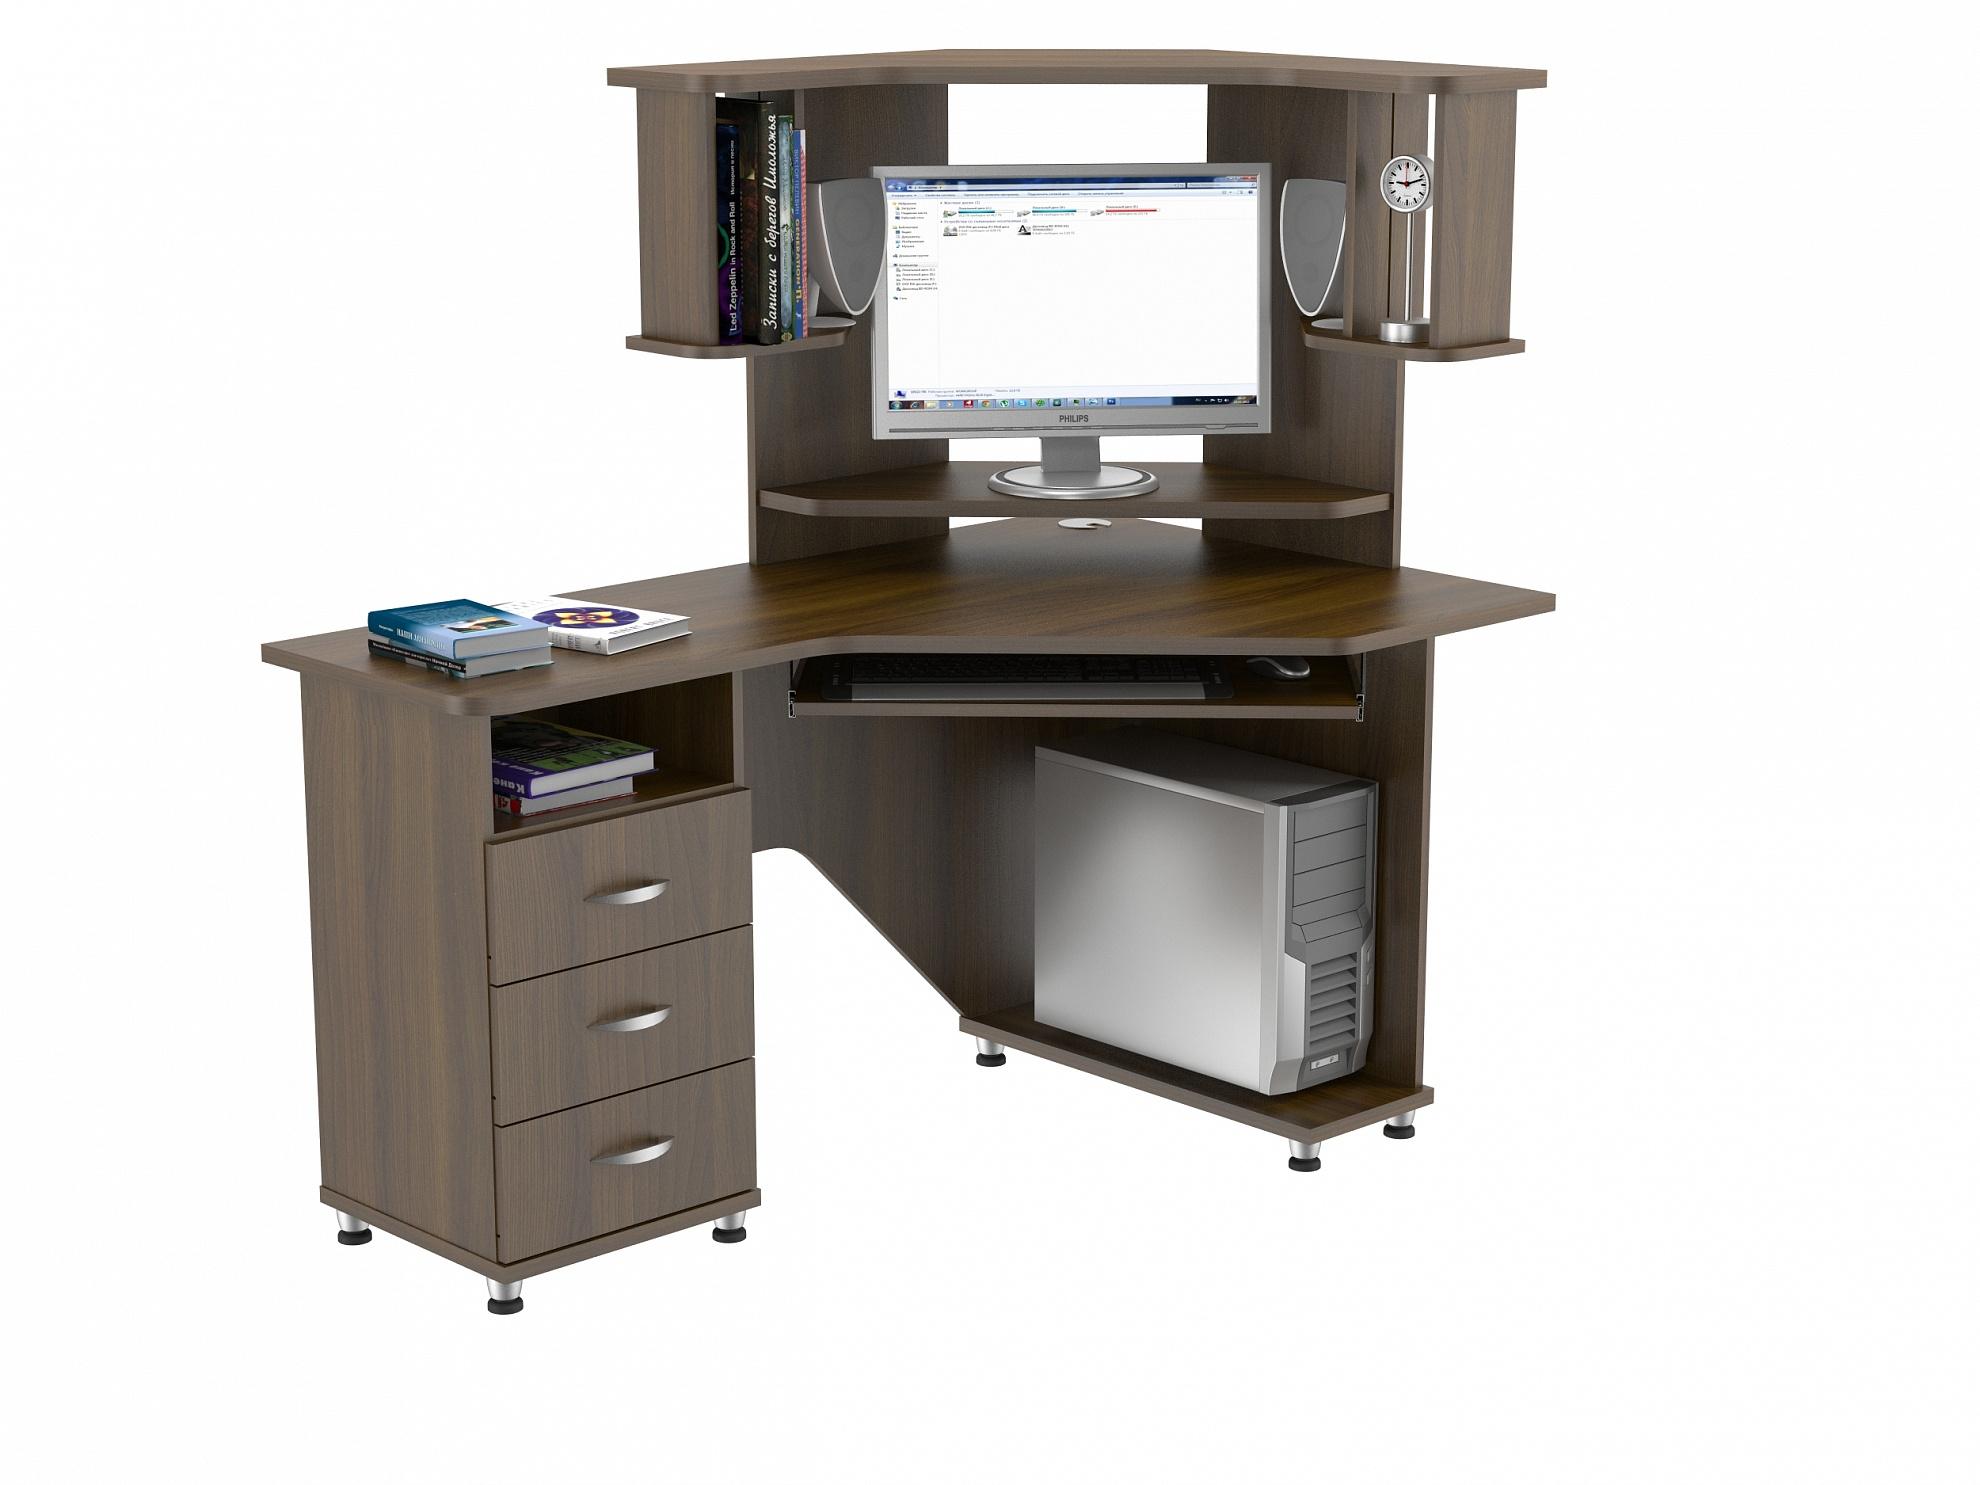 Компьютерный стол КС 20-18м1 компьютерный стол кс 20 16м3